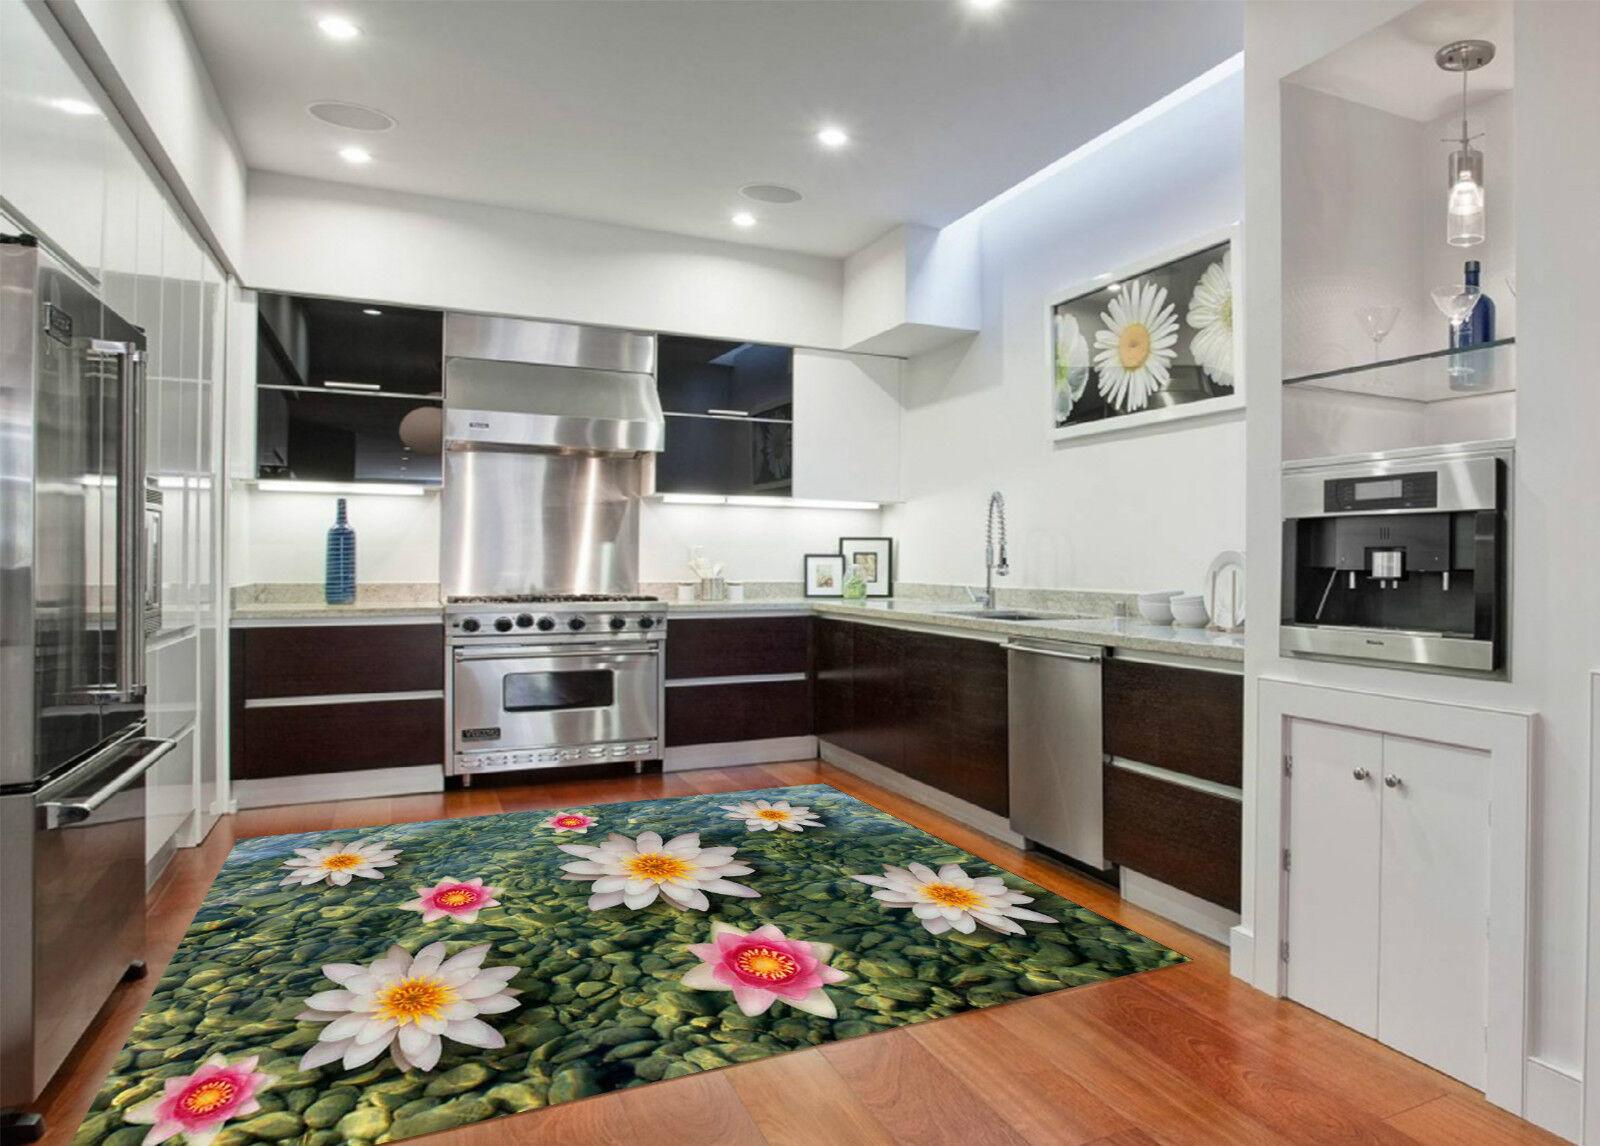 3D Lake Flowers 49 Kitchen Mat Floor MuralsWall Print Wall Deco AJ WALLPAPER CA